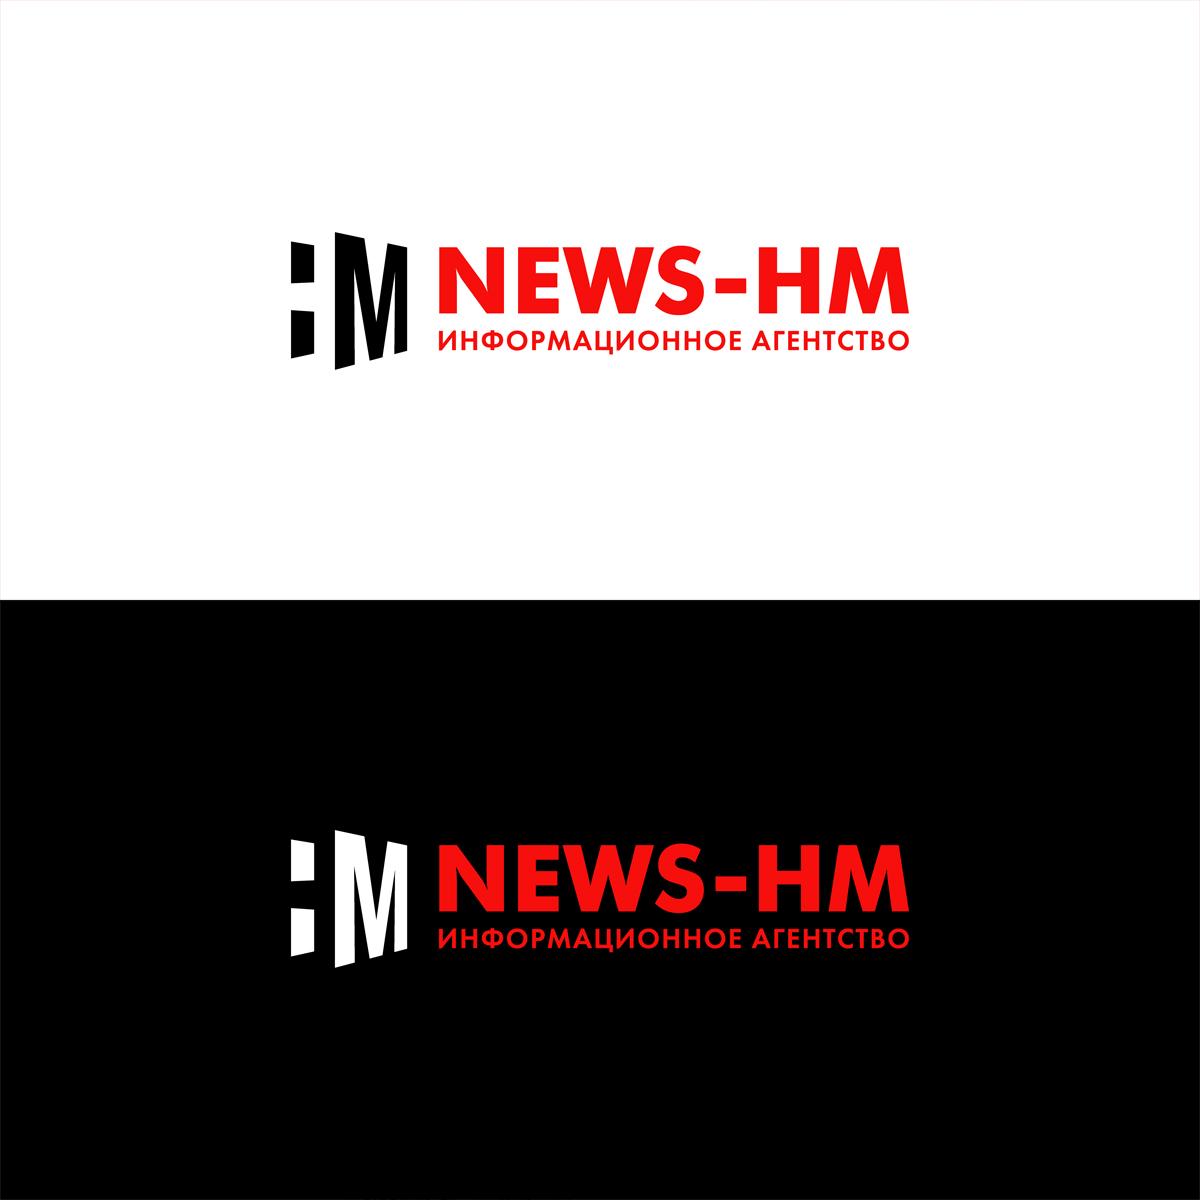 Логотип для информационного агентства фото f_6955aa6596984597.jpg